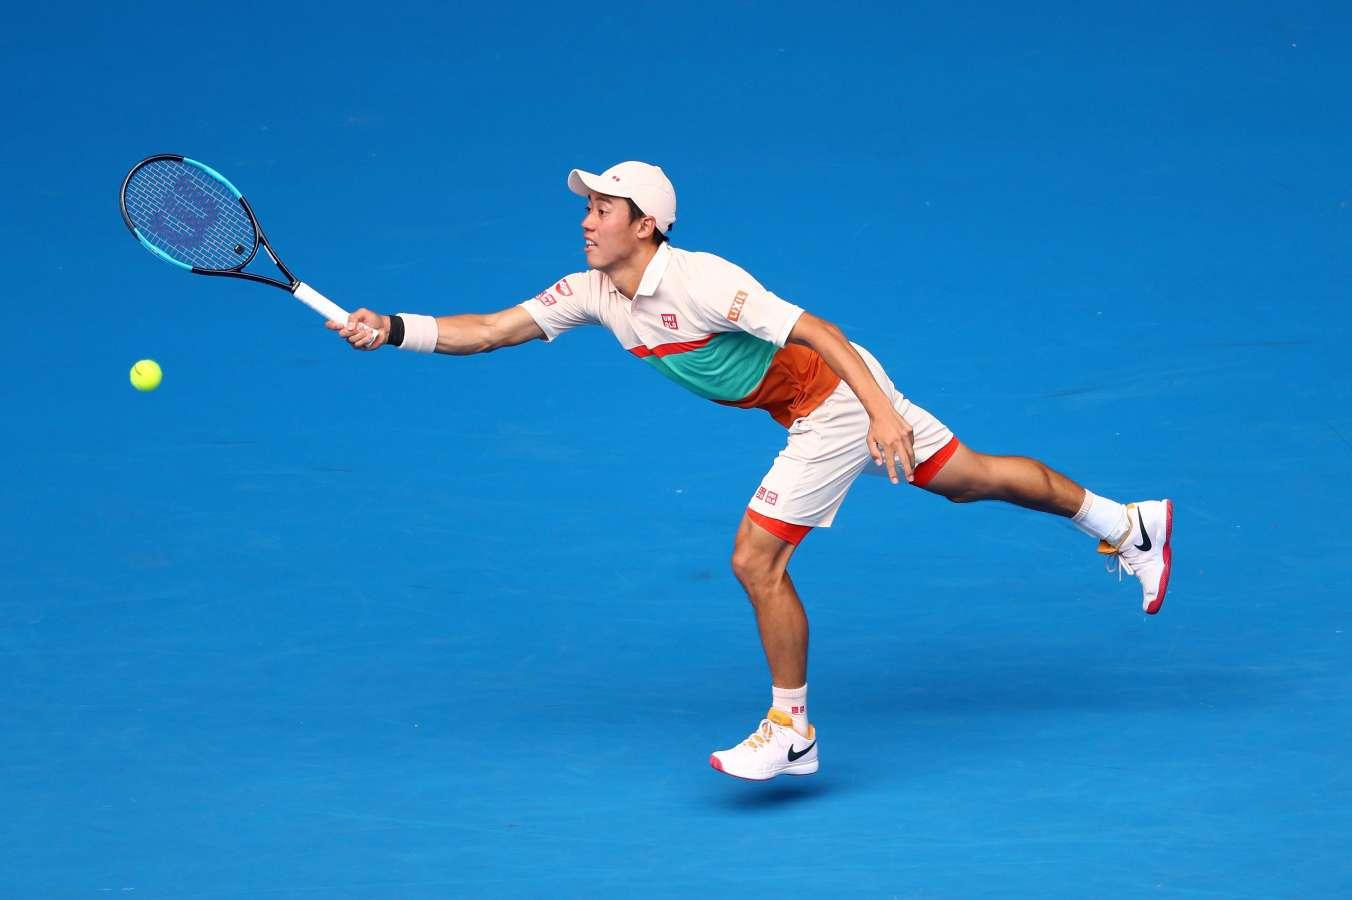 AO 2021: Kei Nishikori admits lack of practice due to